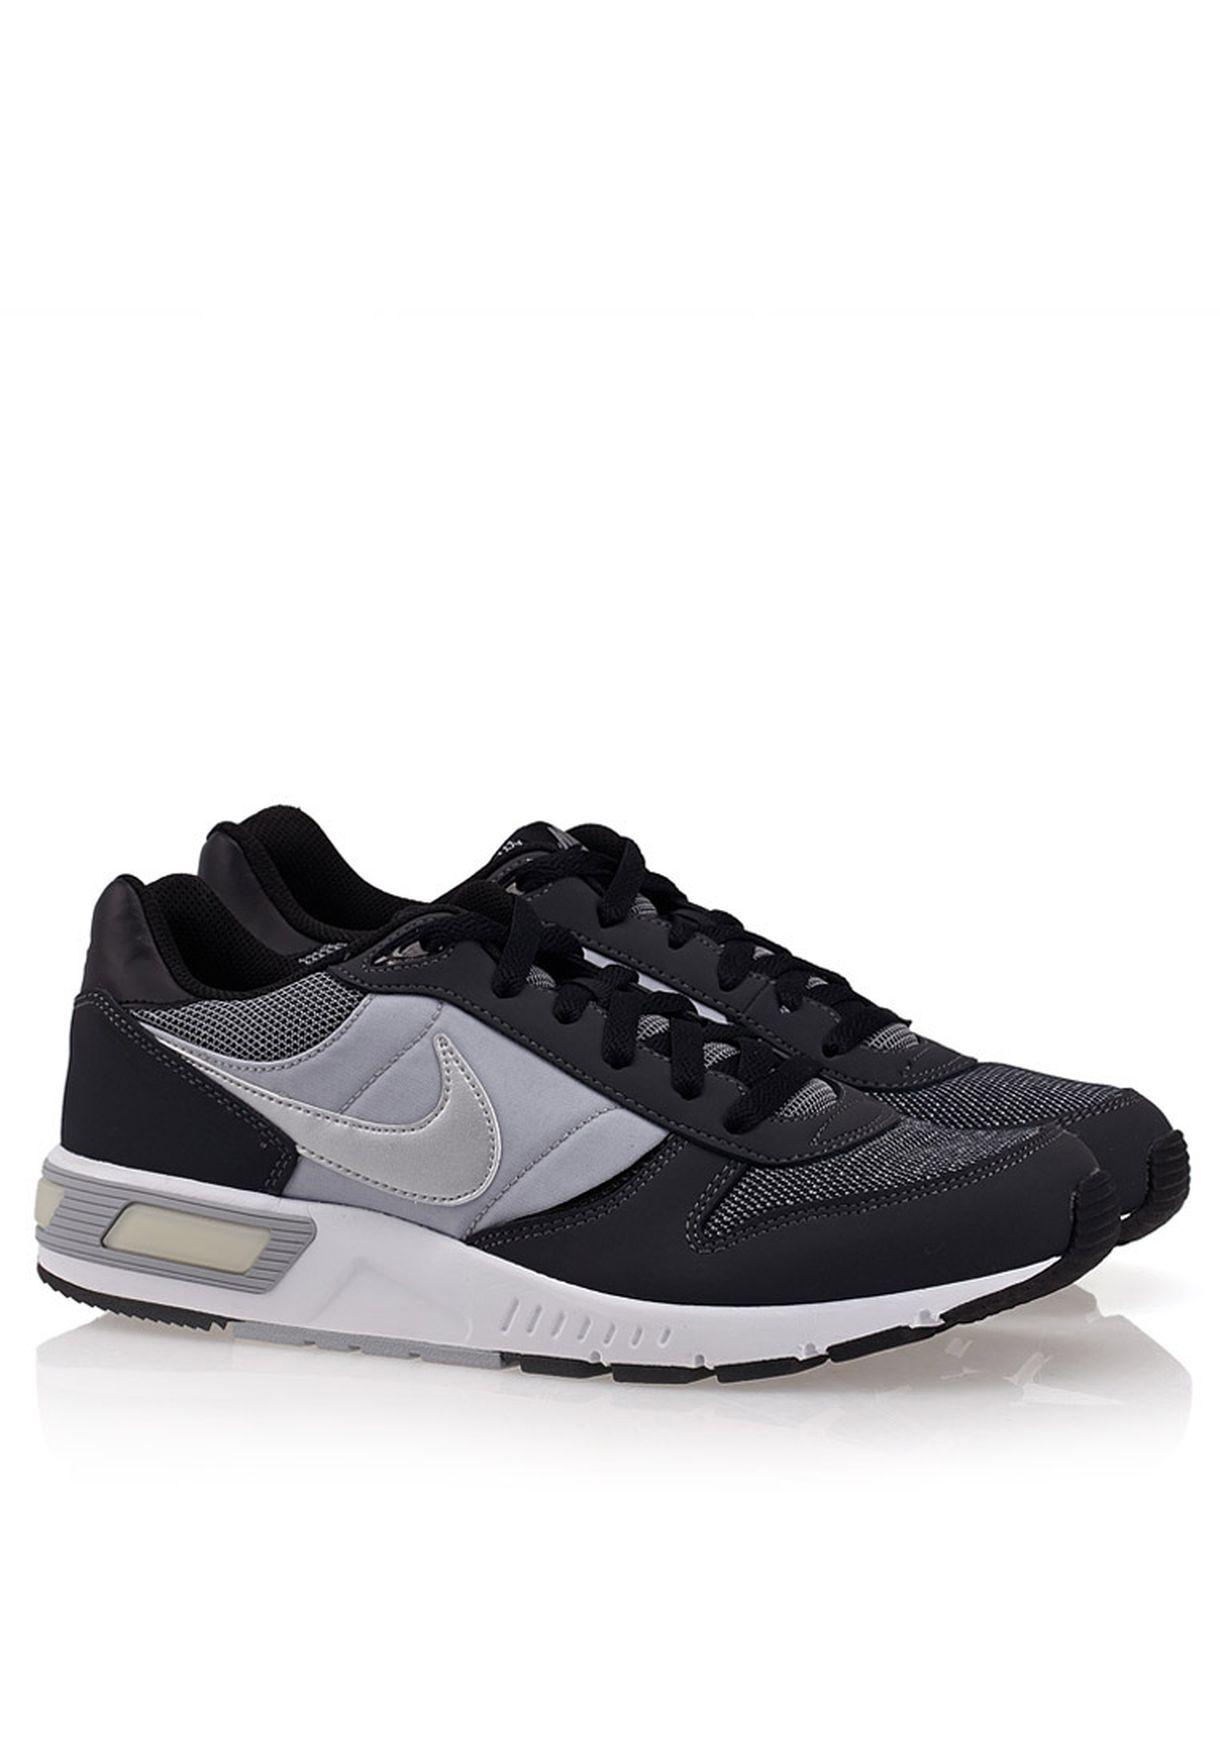 best service c5cd6 cf209 Shop Nike multicolor Nike Nightgazer 644402-090 for Men in UAE ...